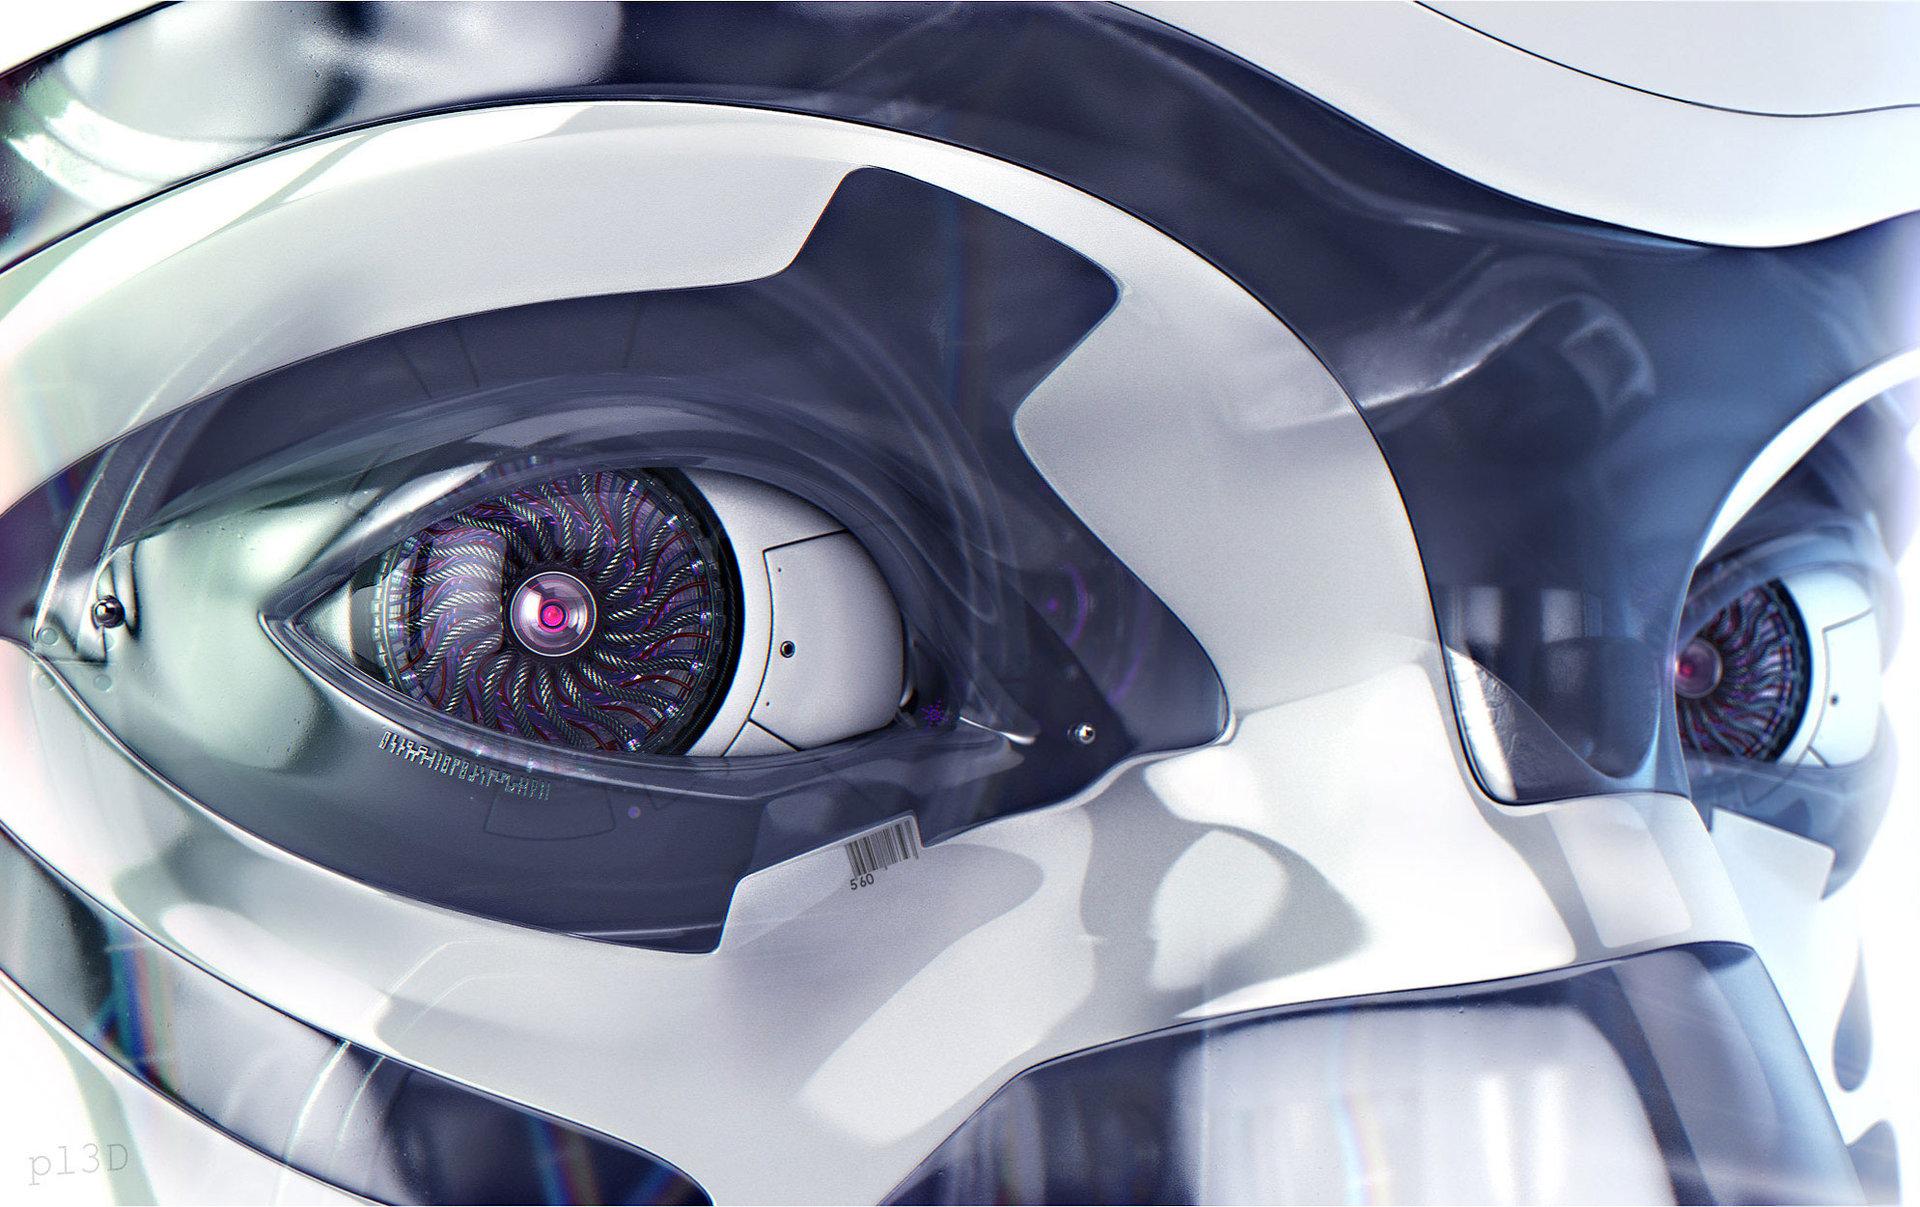 Robotica olho 1 leve